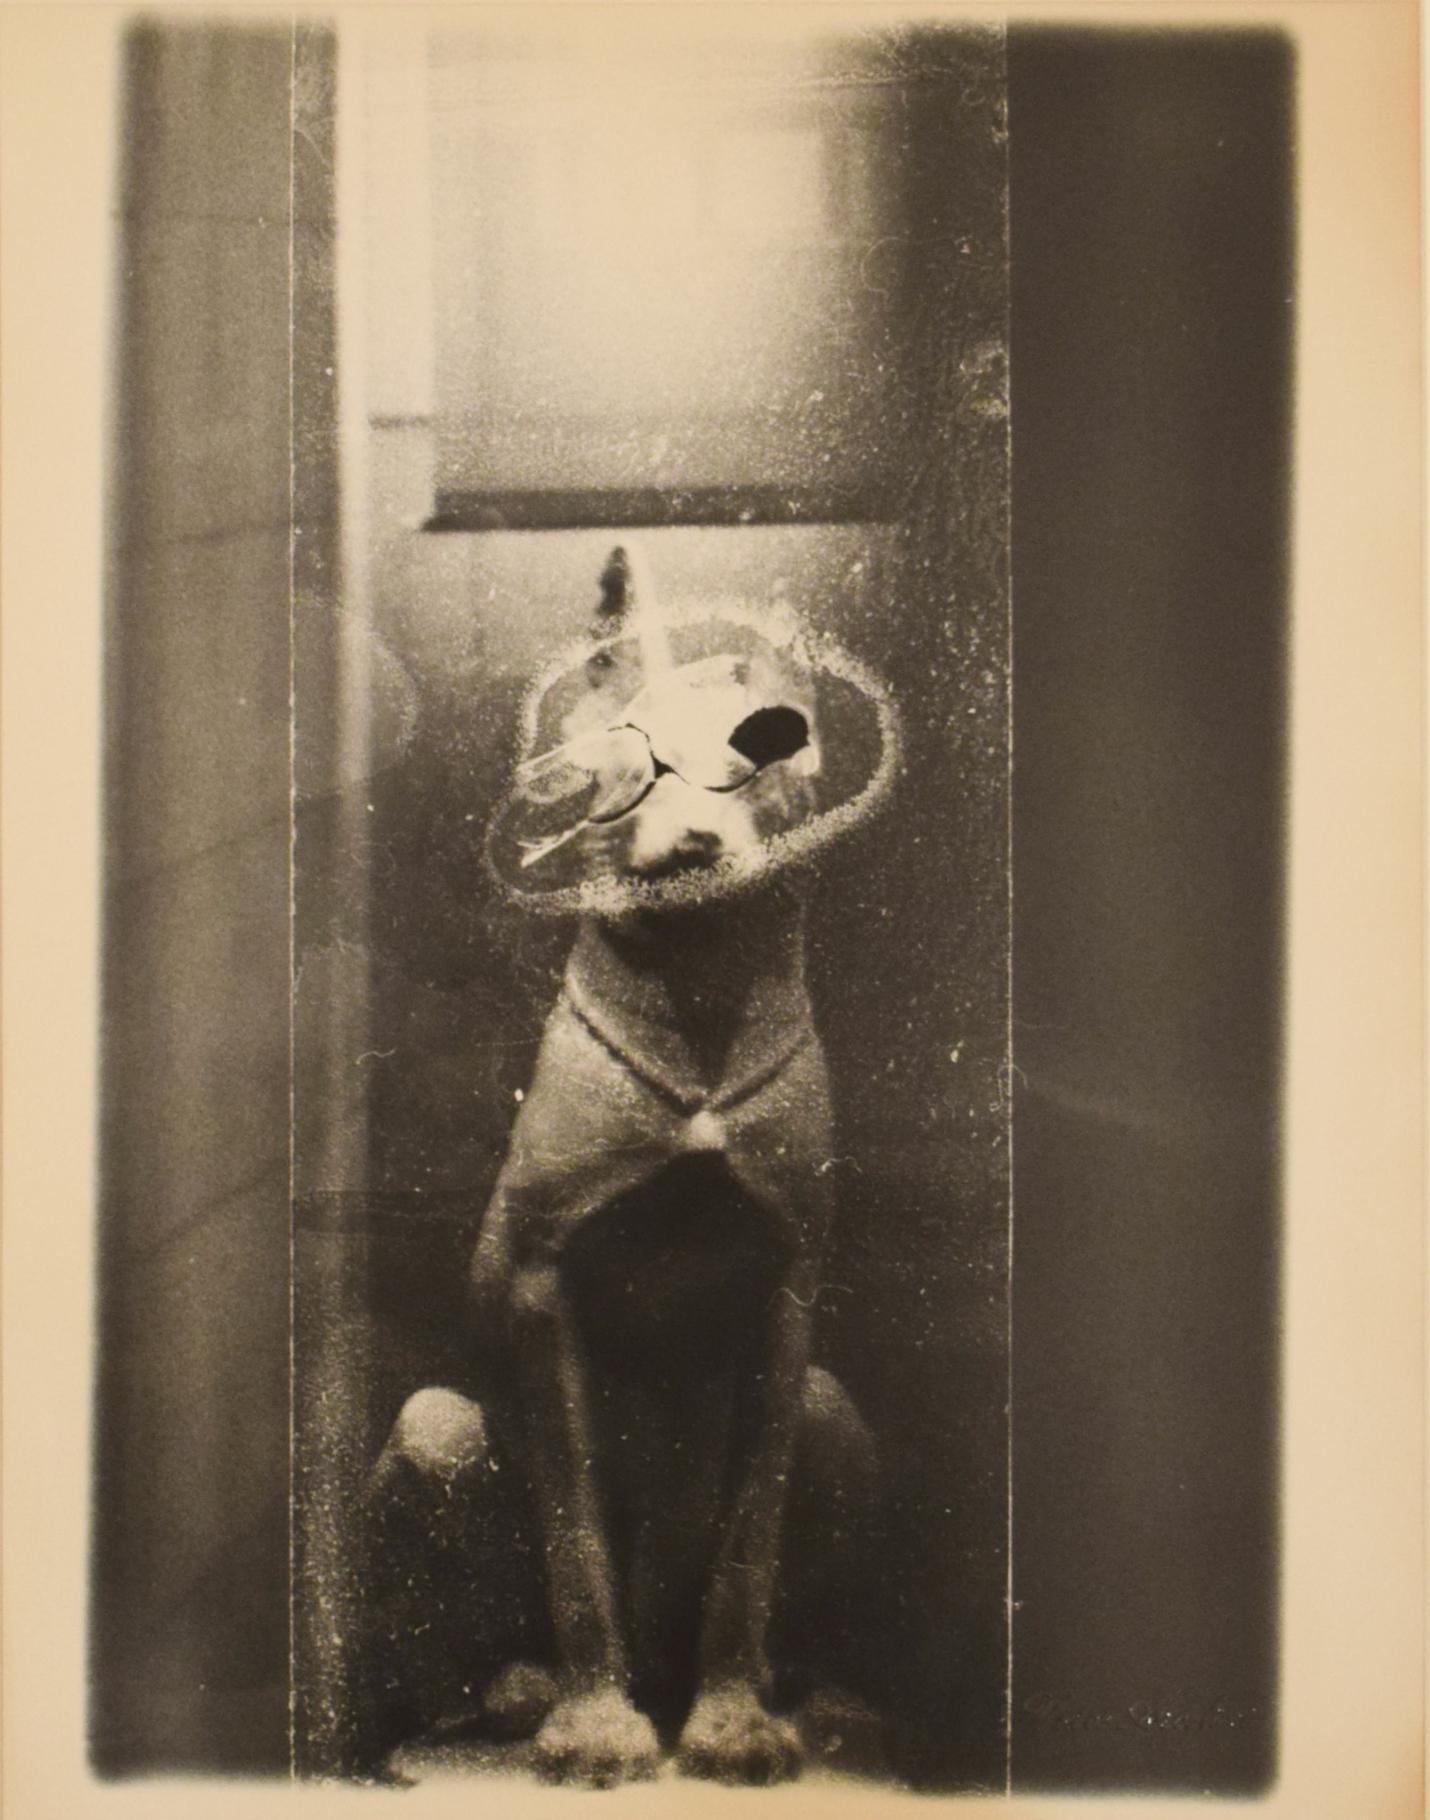 Vasco Ascolini,  Bestiario Fantastico - Grey Dreams , 2001, single photograph silver print, 35,5 x 27,7 cm, courtesy Galleria Weber & Weber